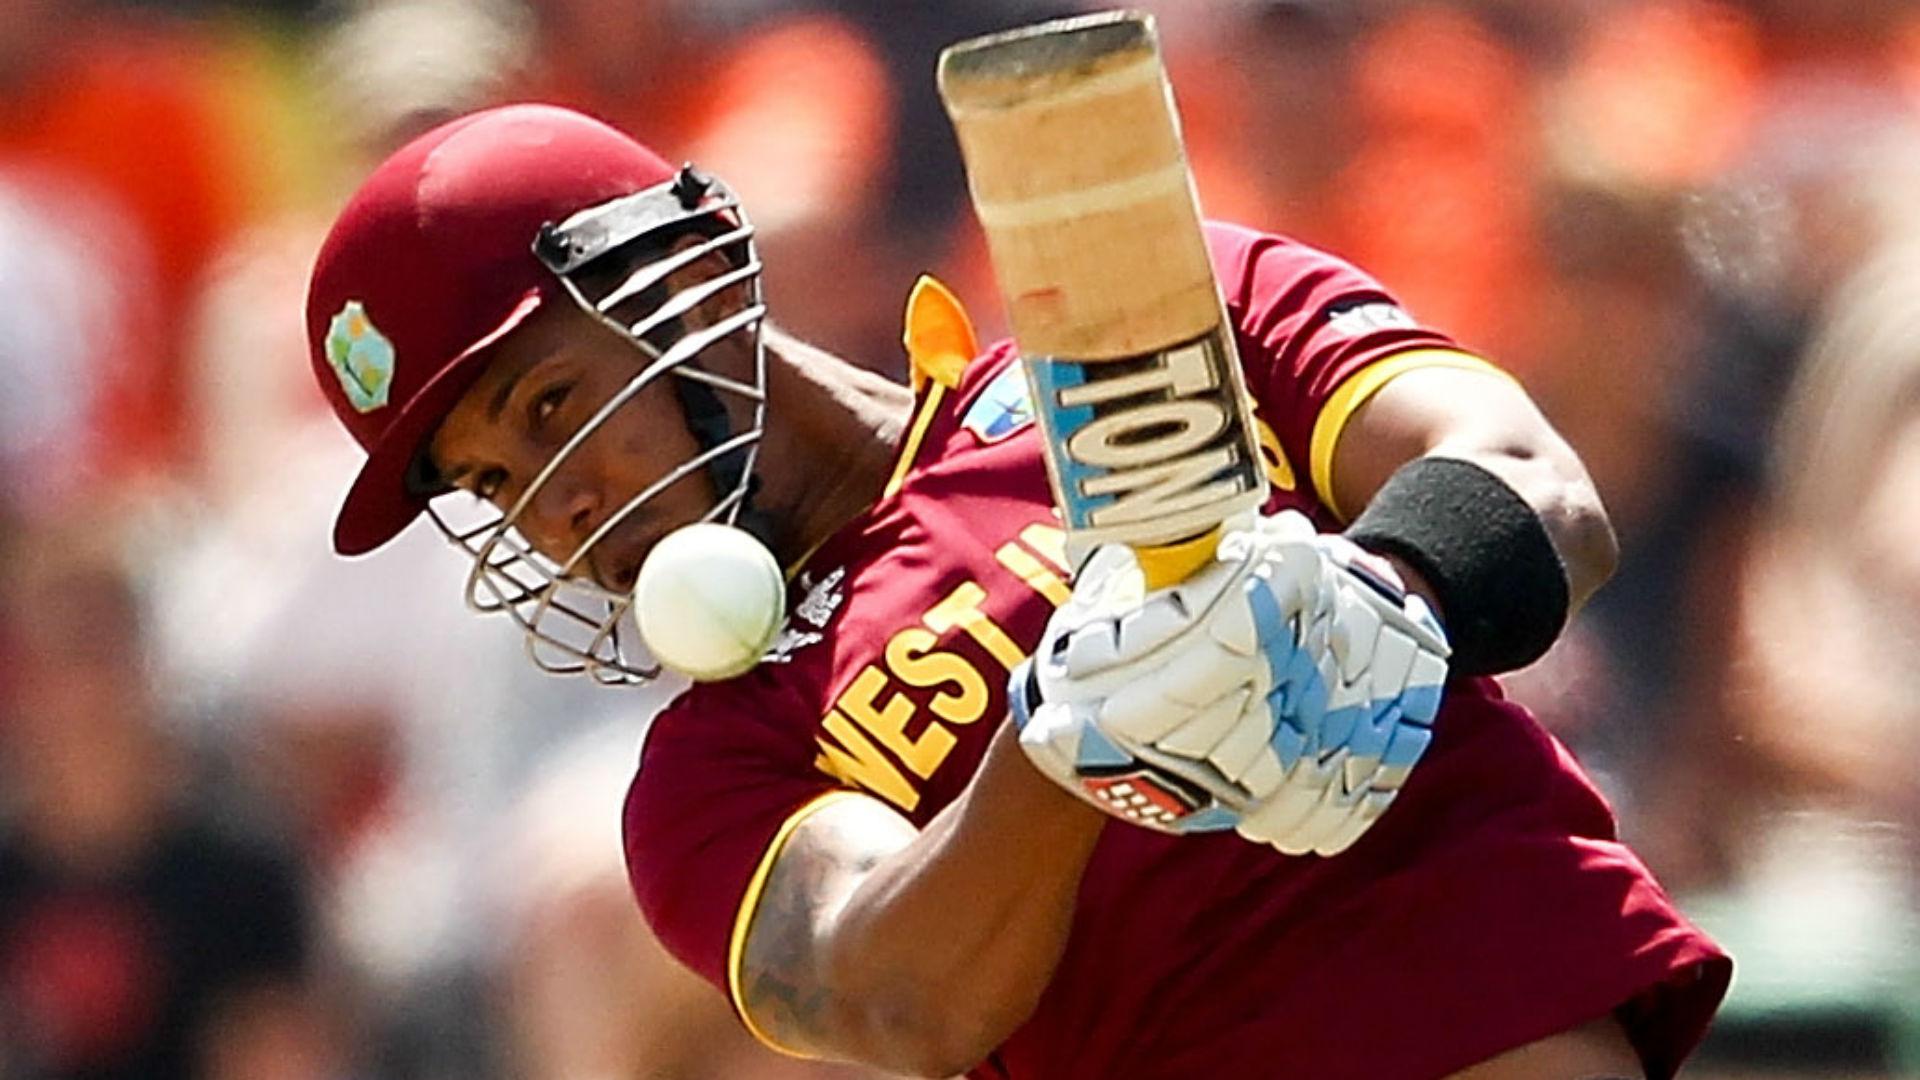 'Old-school' Simmons revels in victory as Kohli laments fielding woes